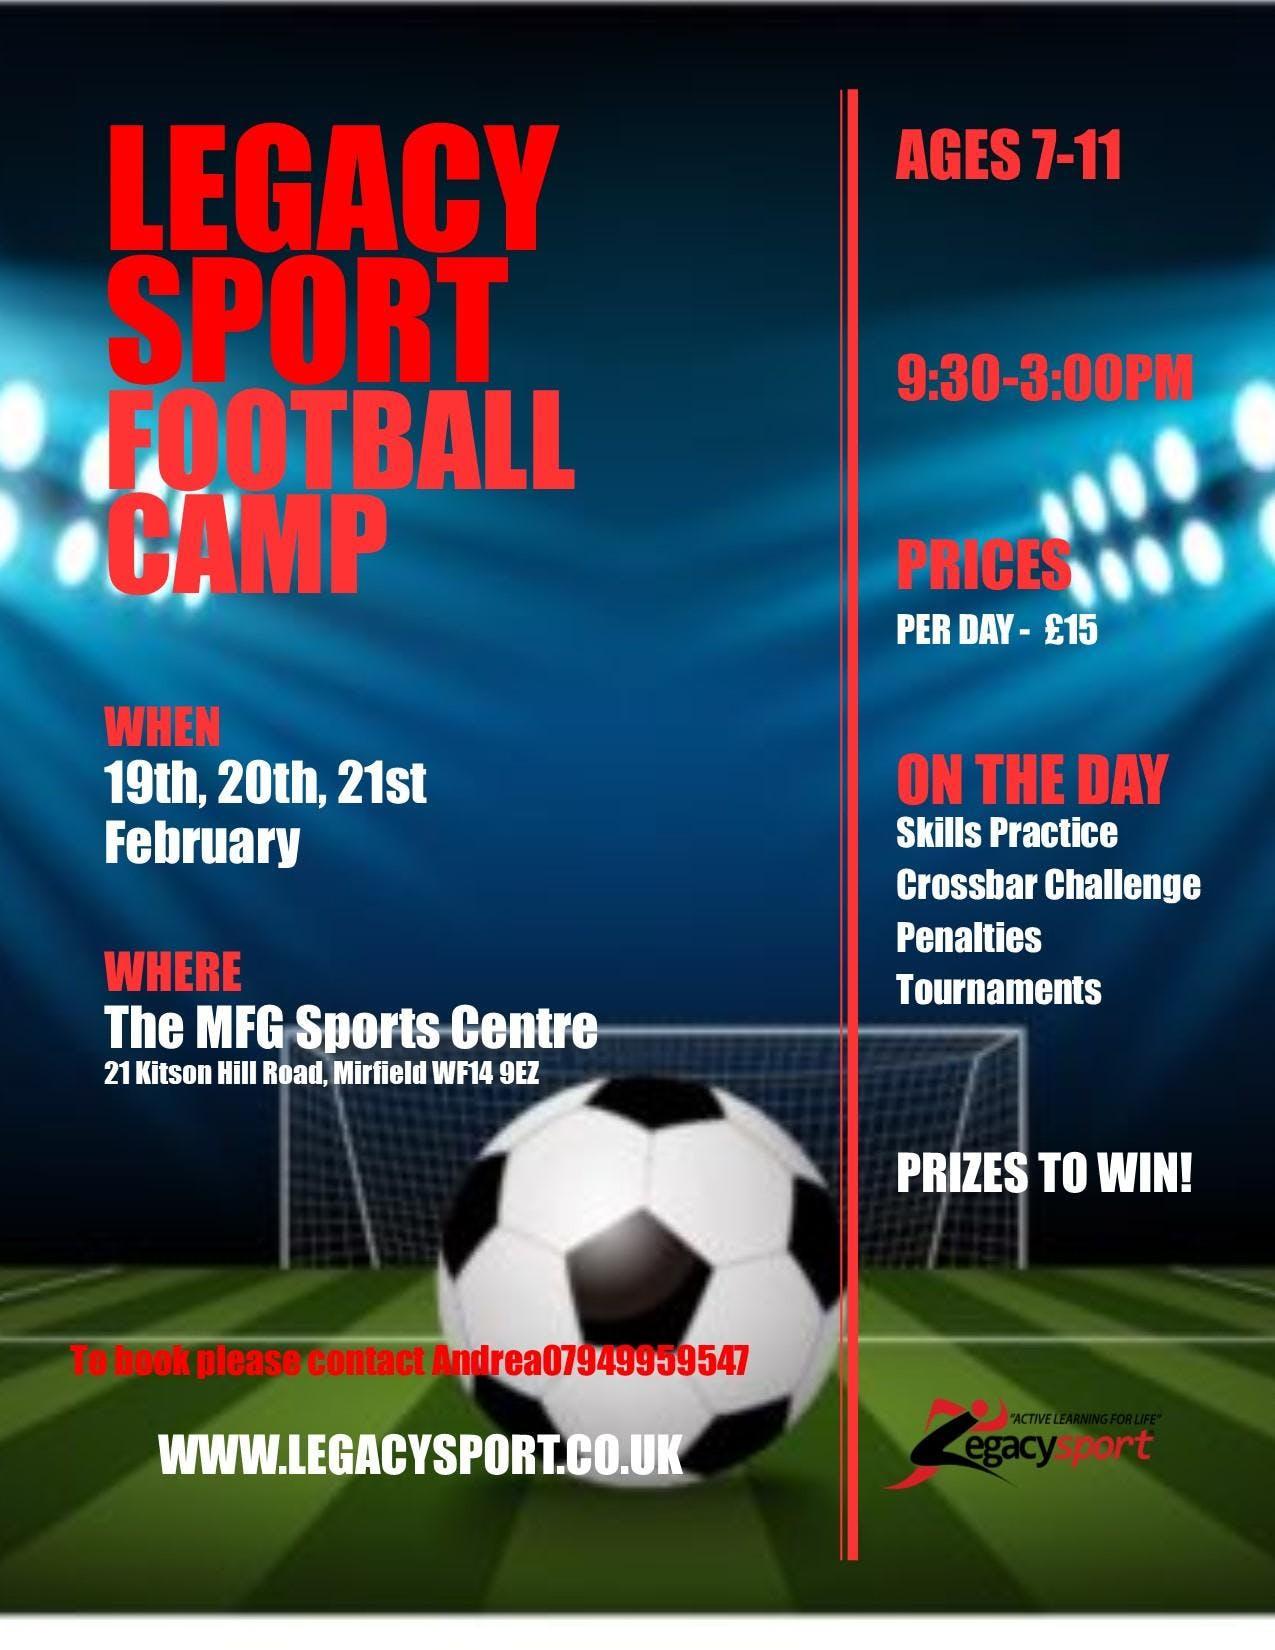 Legacy Sport Football Camp